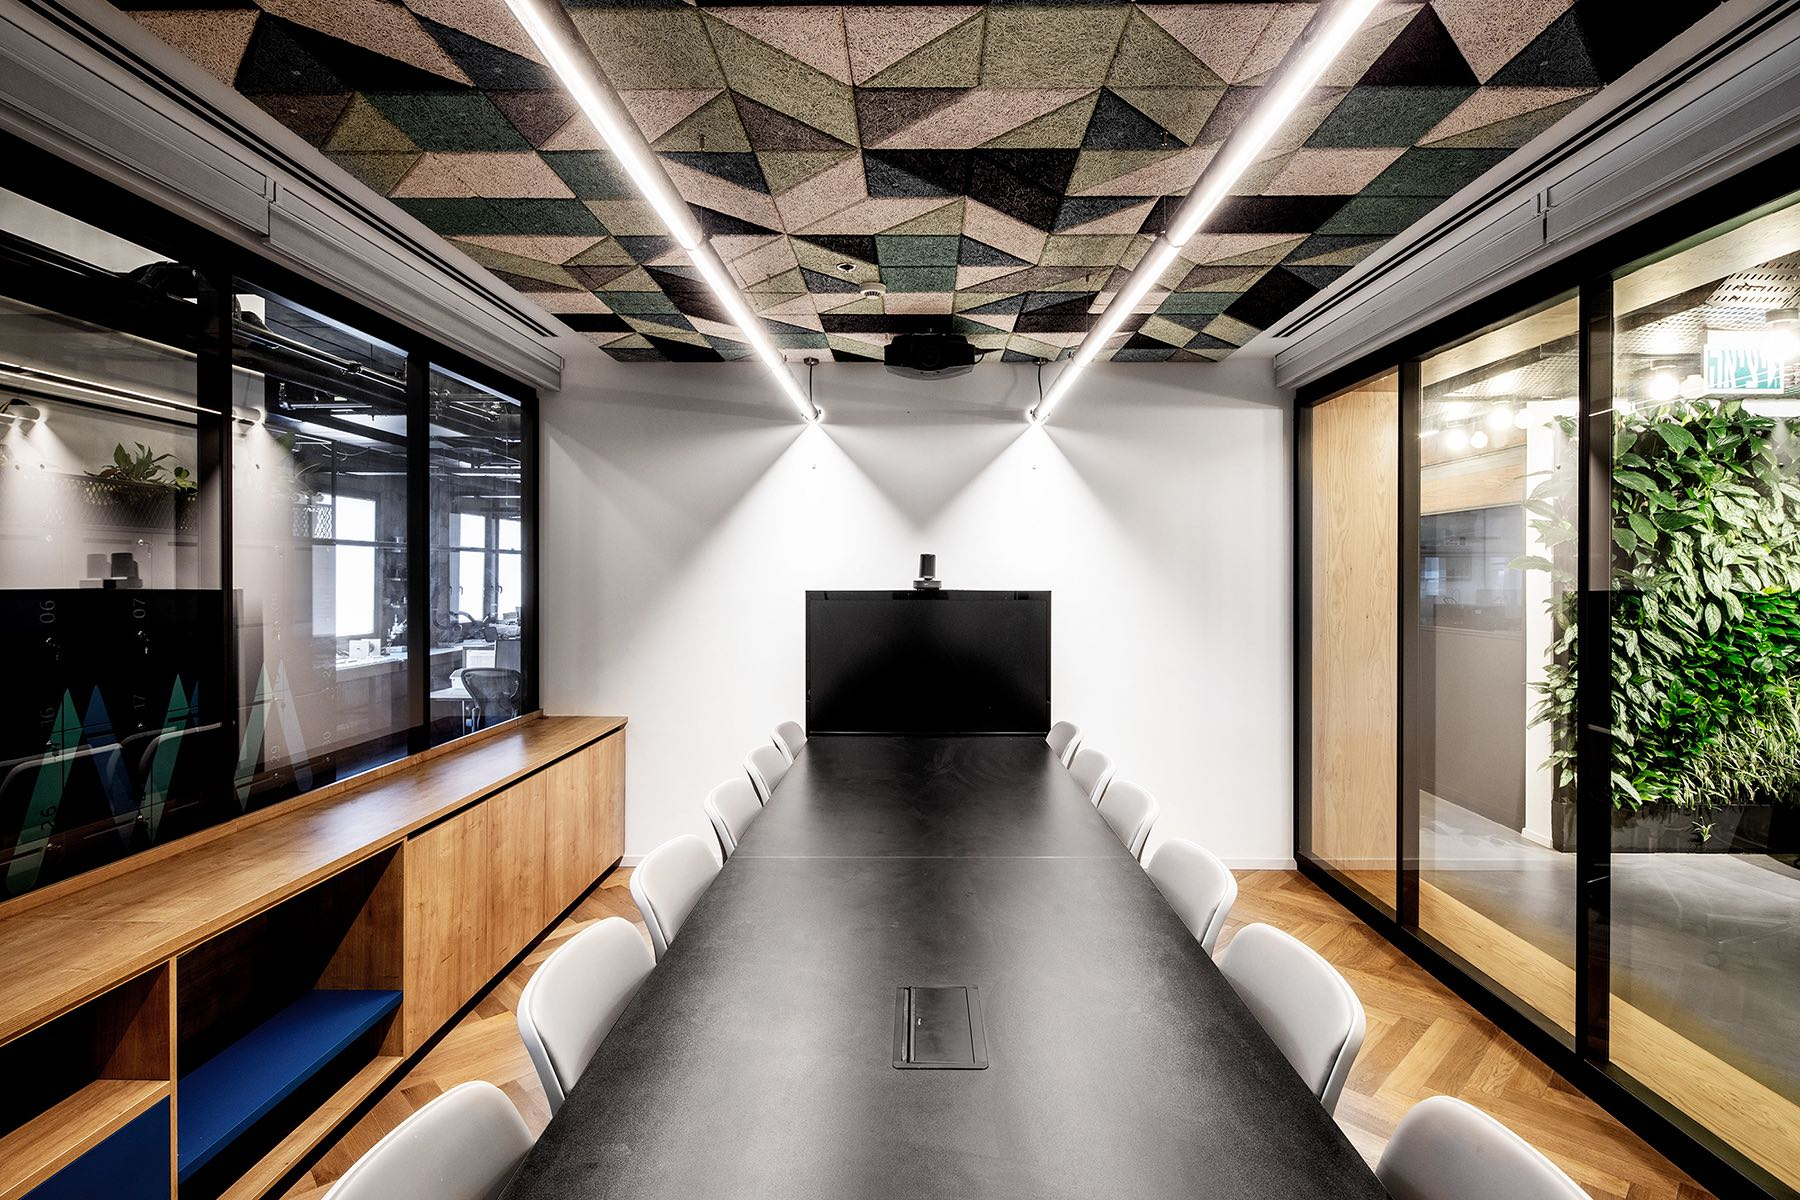 A Look Inside Art Medical's Biophilic Tel Aviv Office